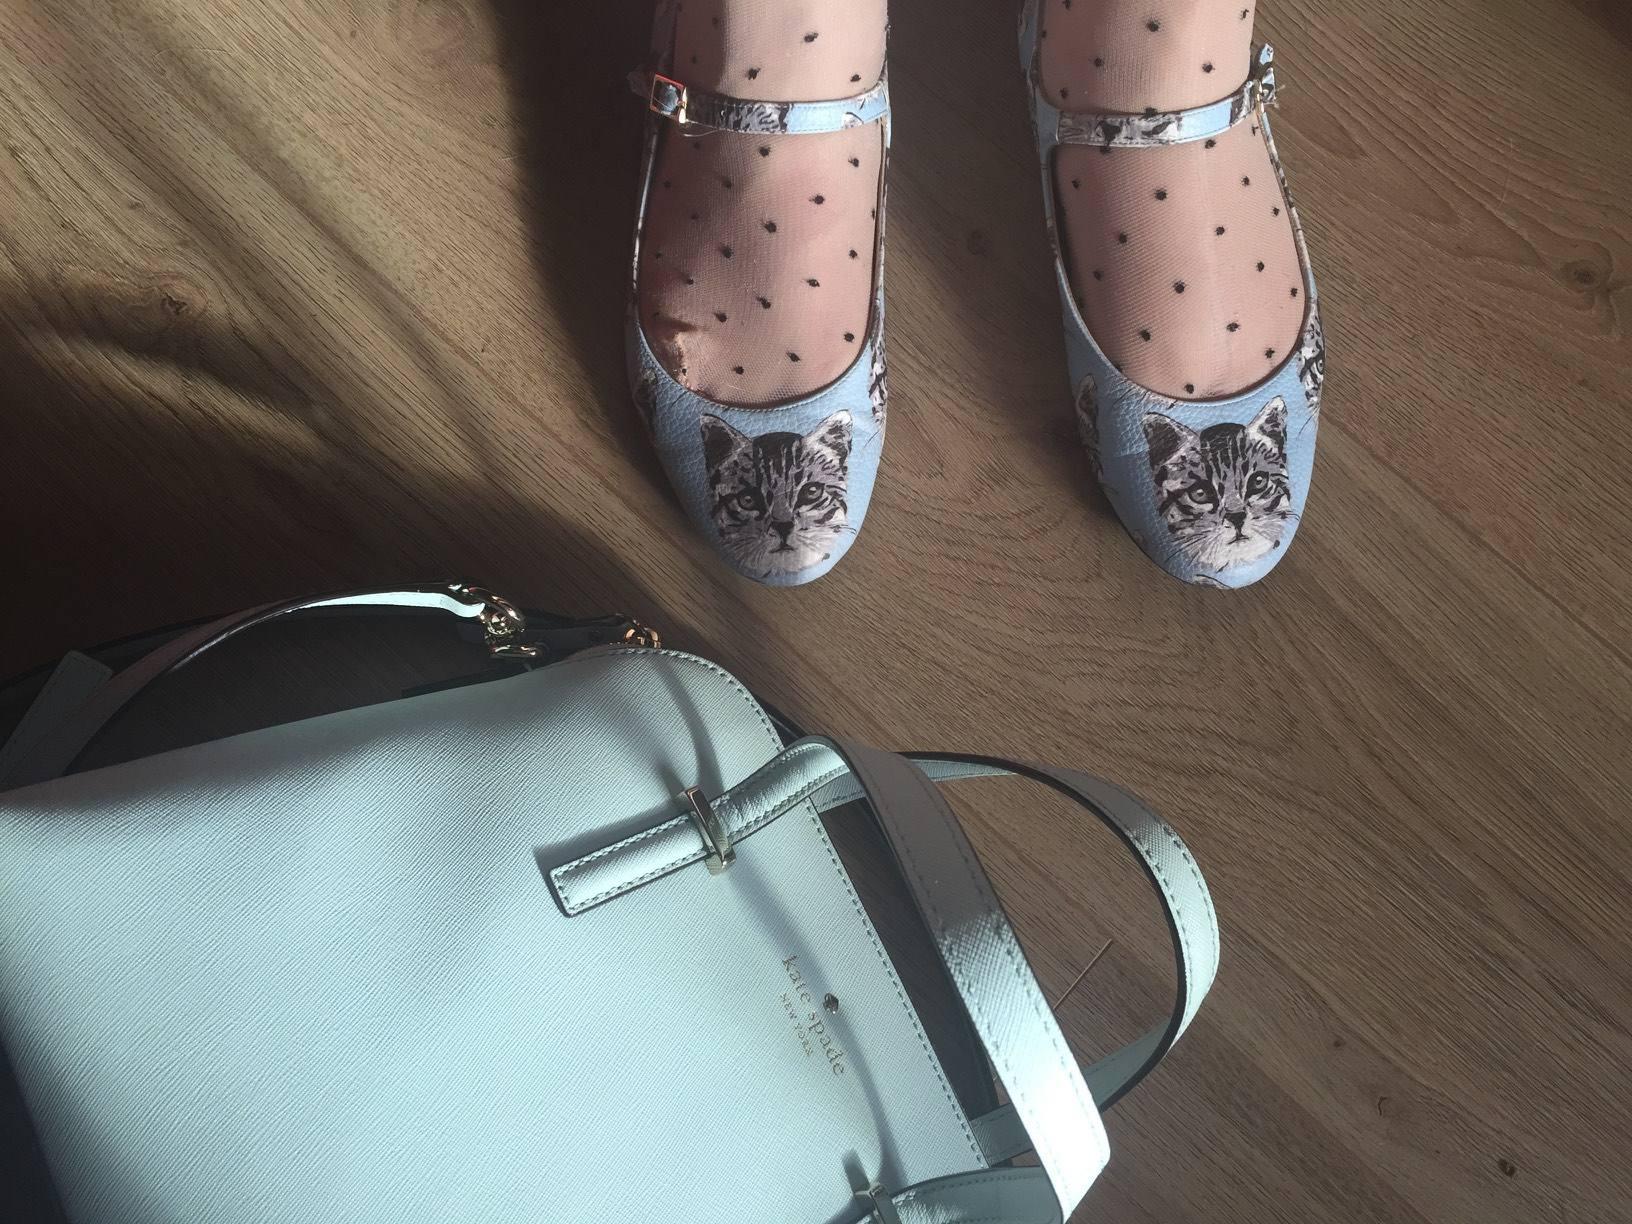 A Week on my Feet - Wednesday